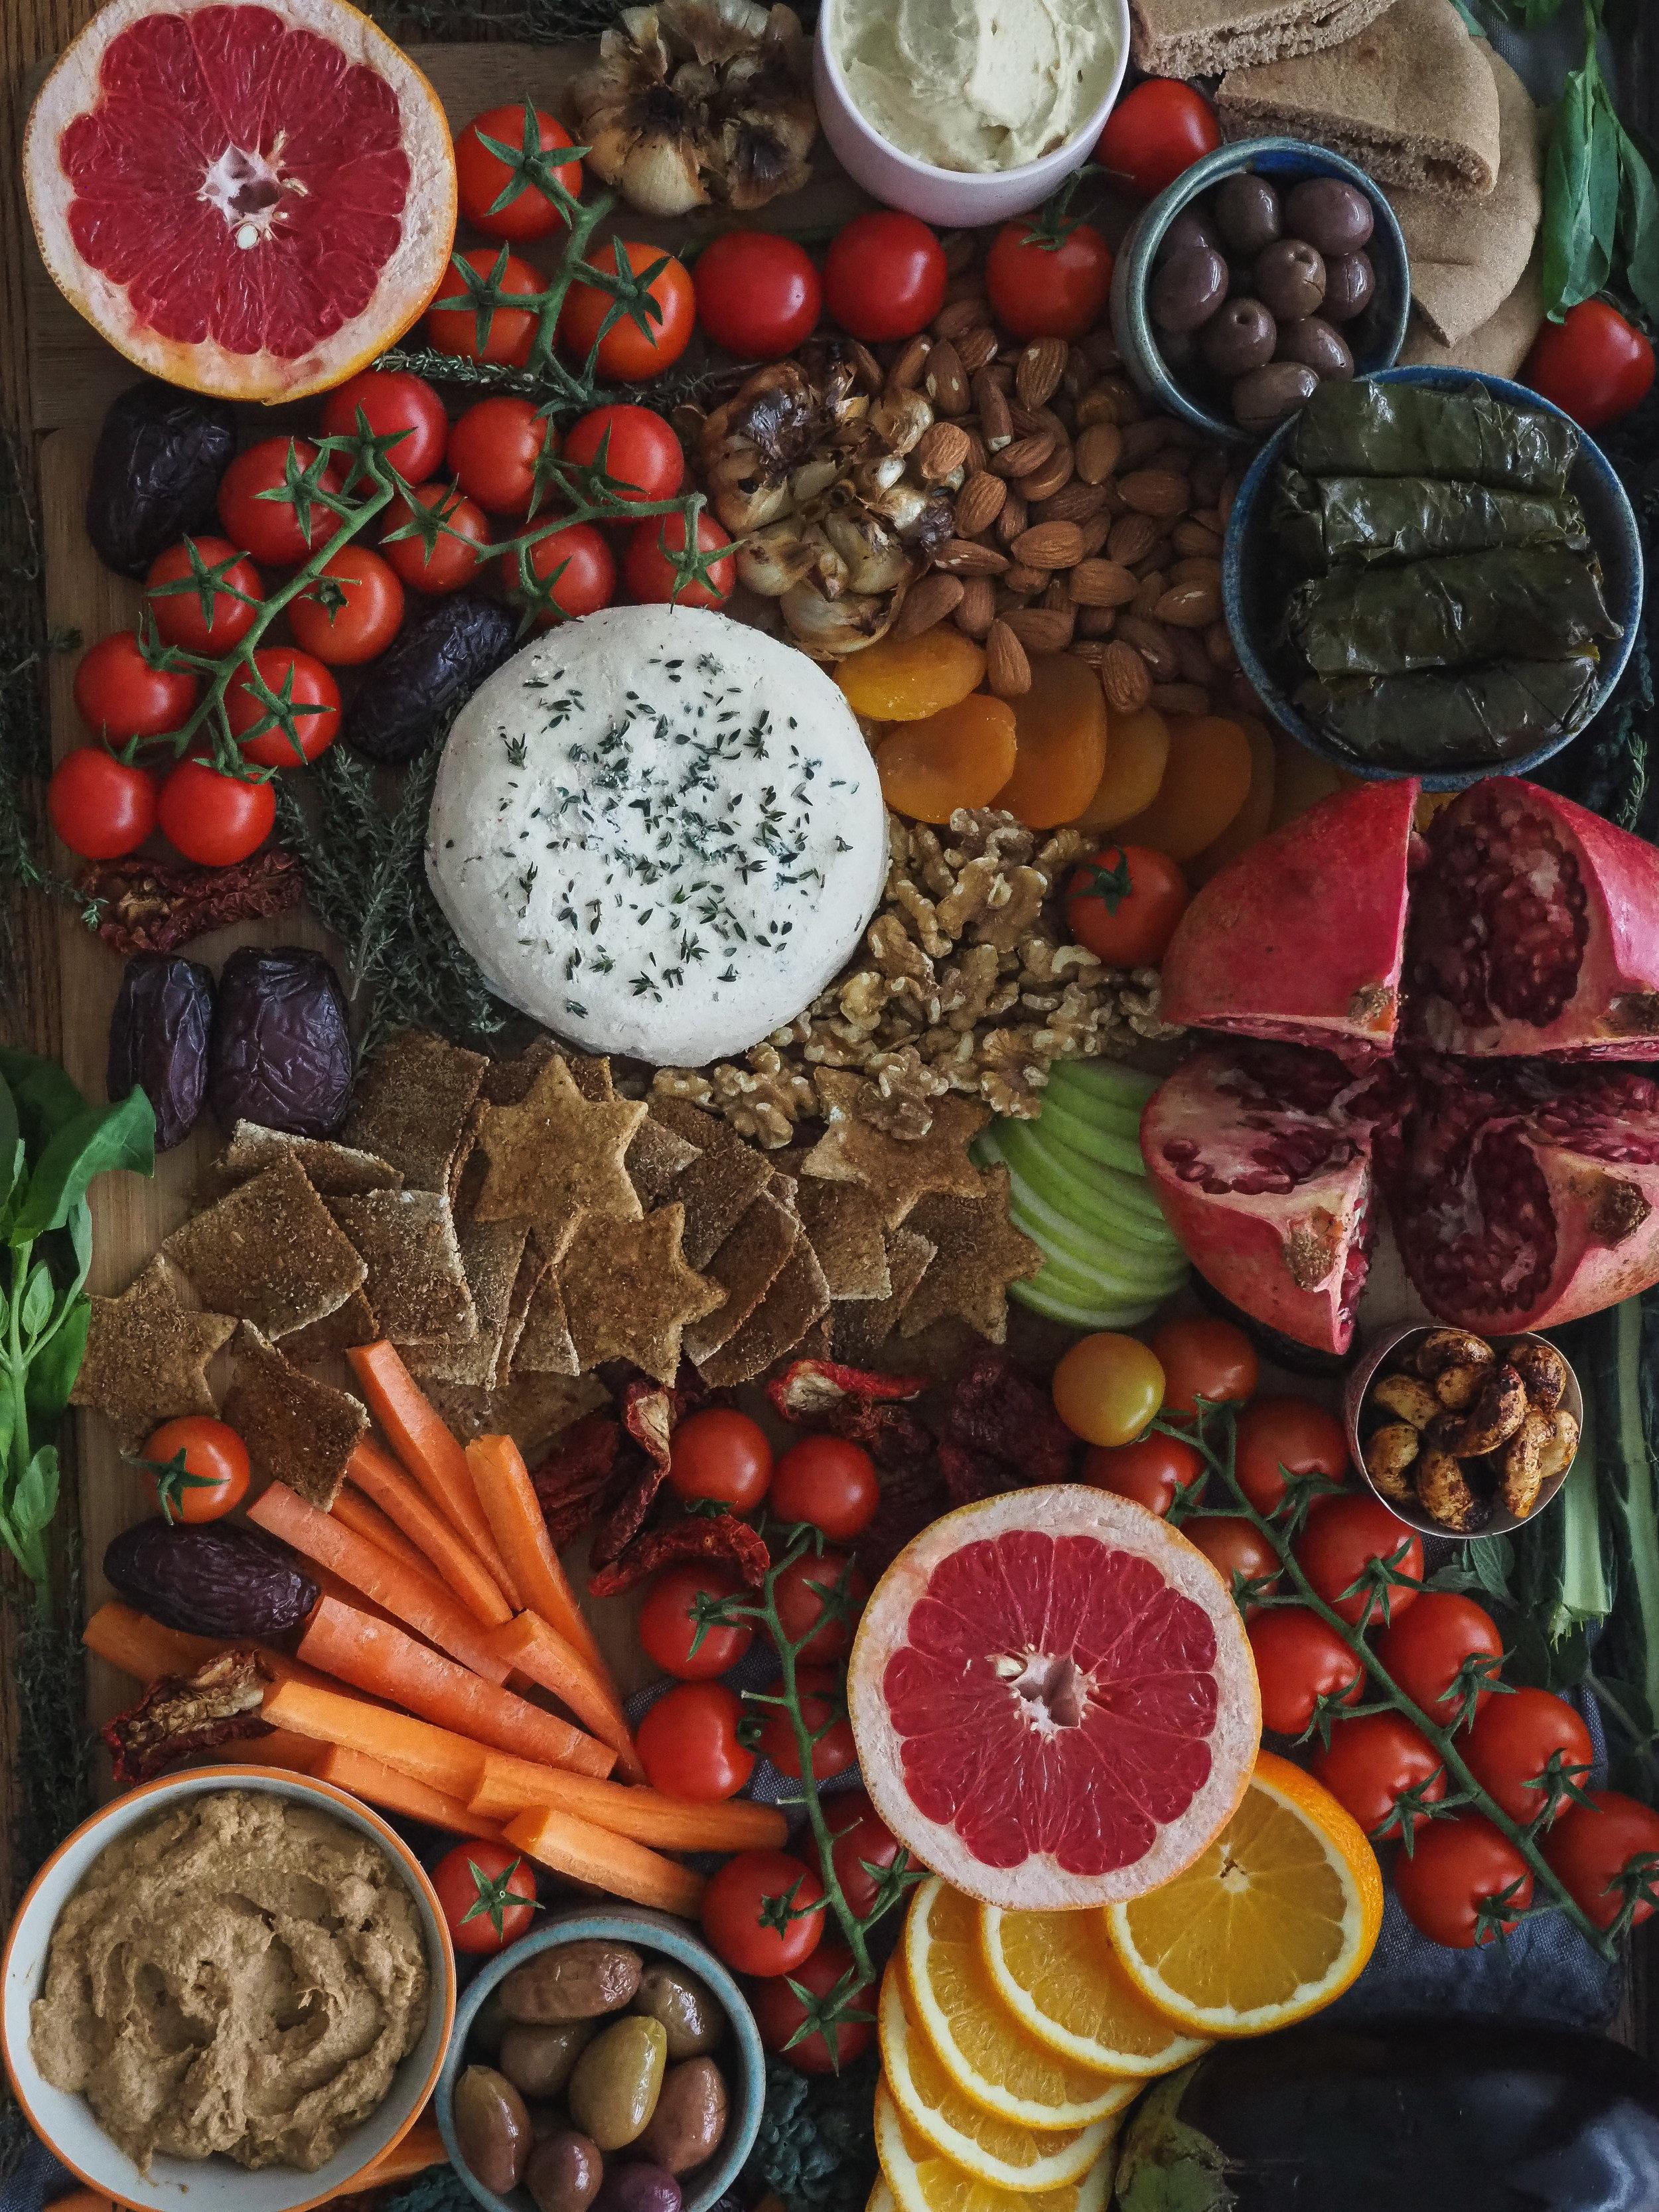 Vegan Appetizer Party Platter / Snack Board Spread | Plant-Based, Homemade  All Rights Reserved © Elena Hollenhorst